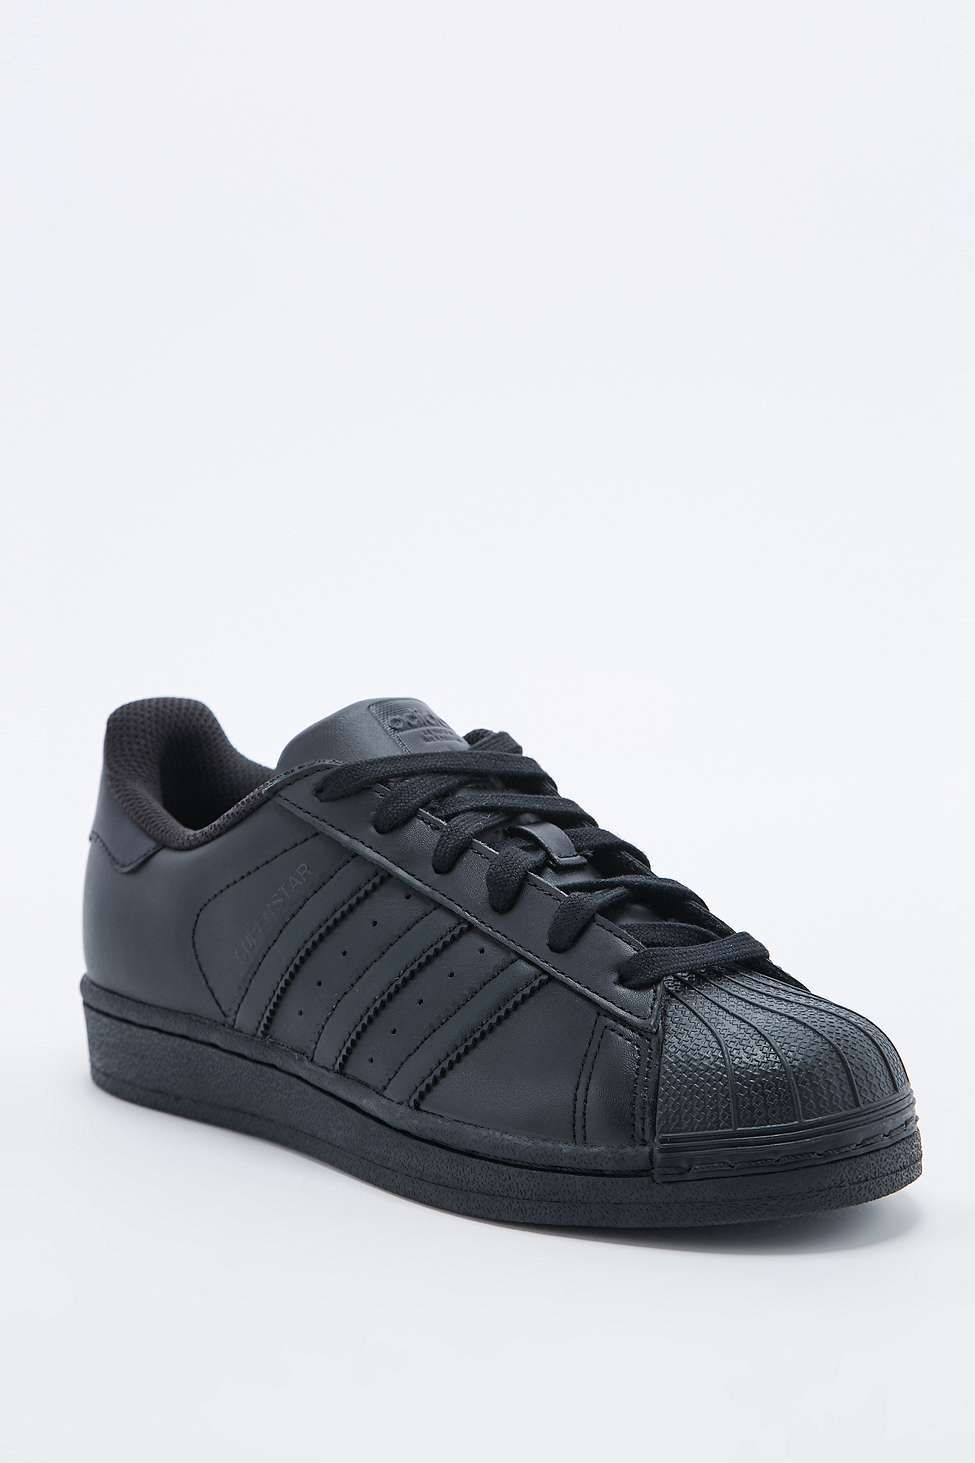 Adidas Originals Superstar All Black Trainers Adidas Shoes Superstar Black Adidas Shoes Adidas Superstar